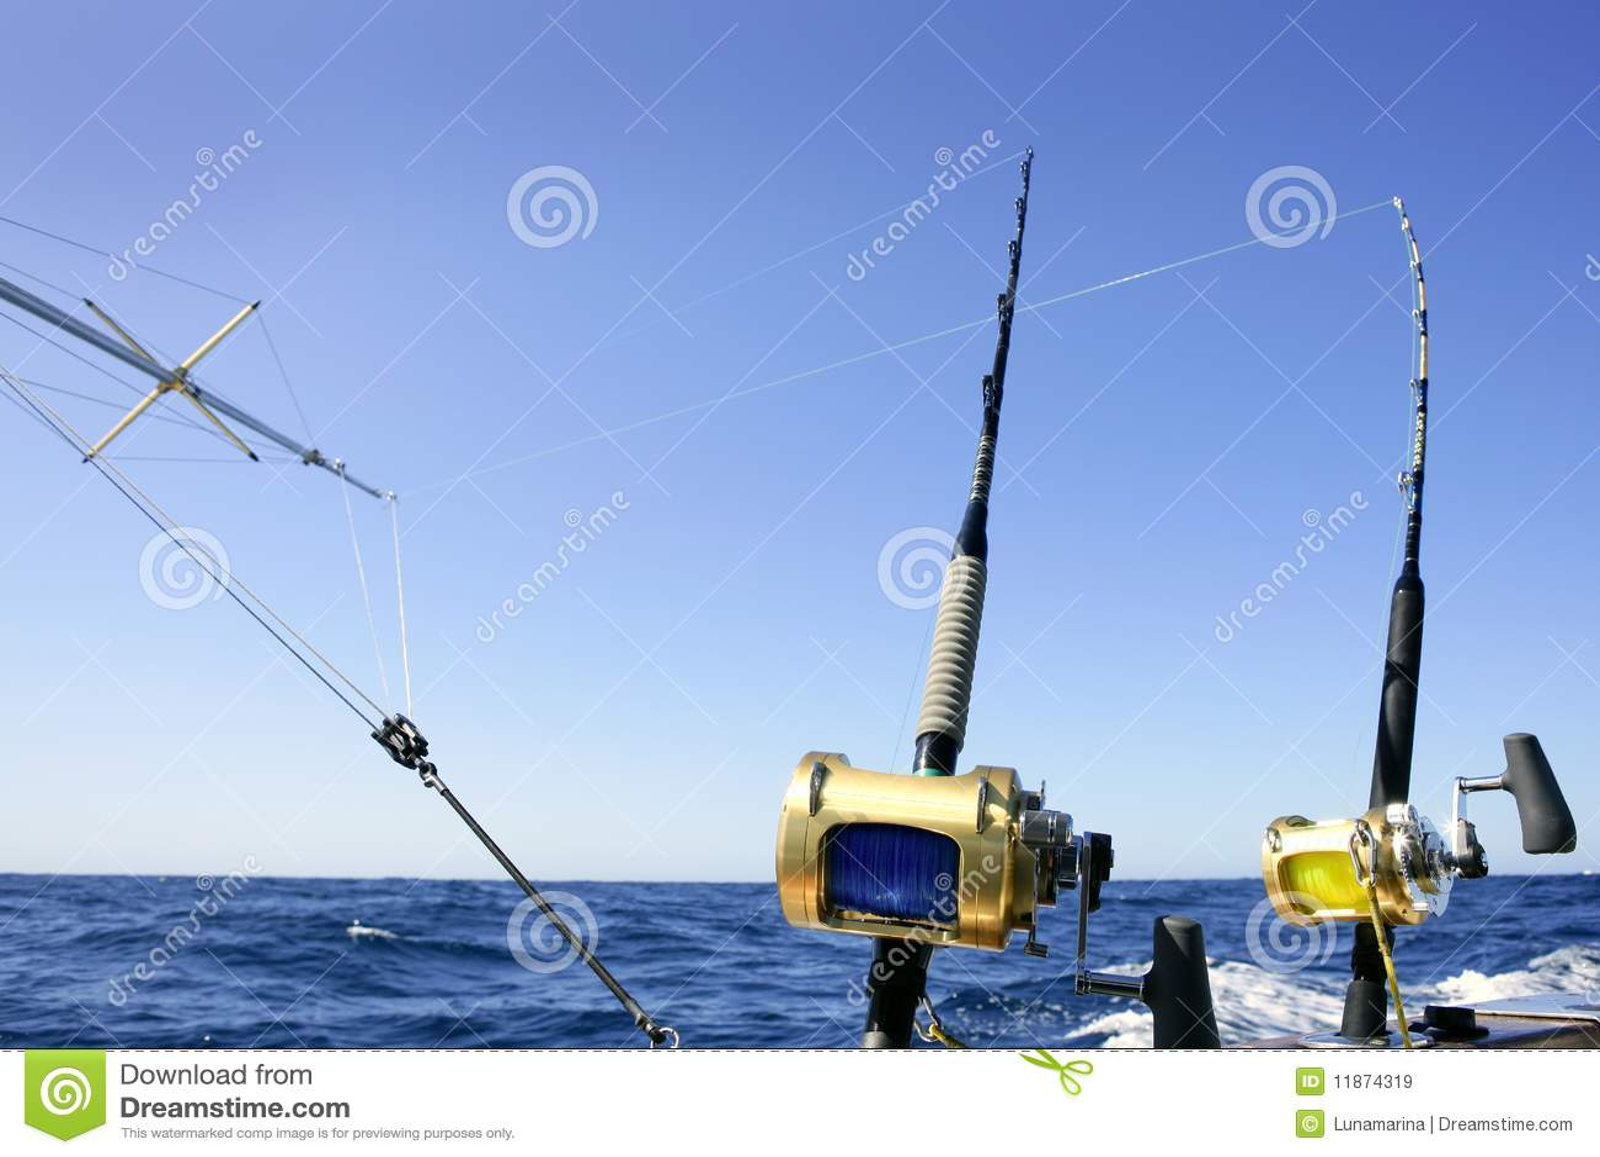 Big game boat fishing in deep sea royalty free stock for Sea fishing games